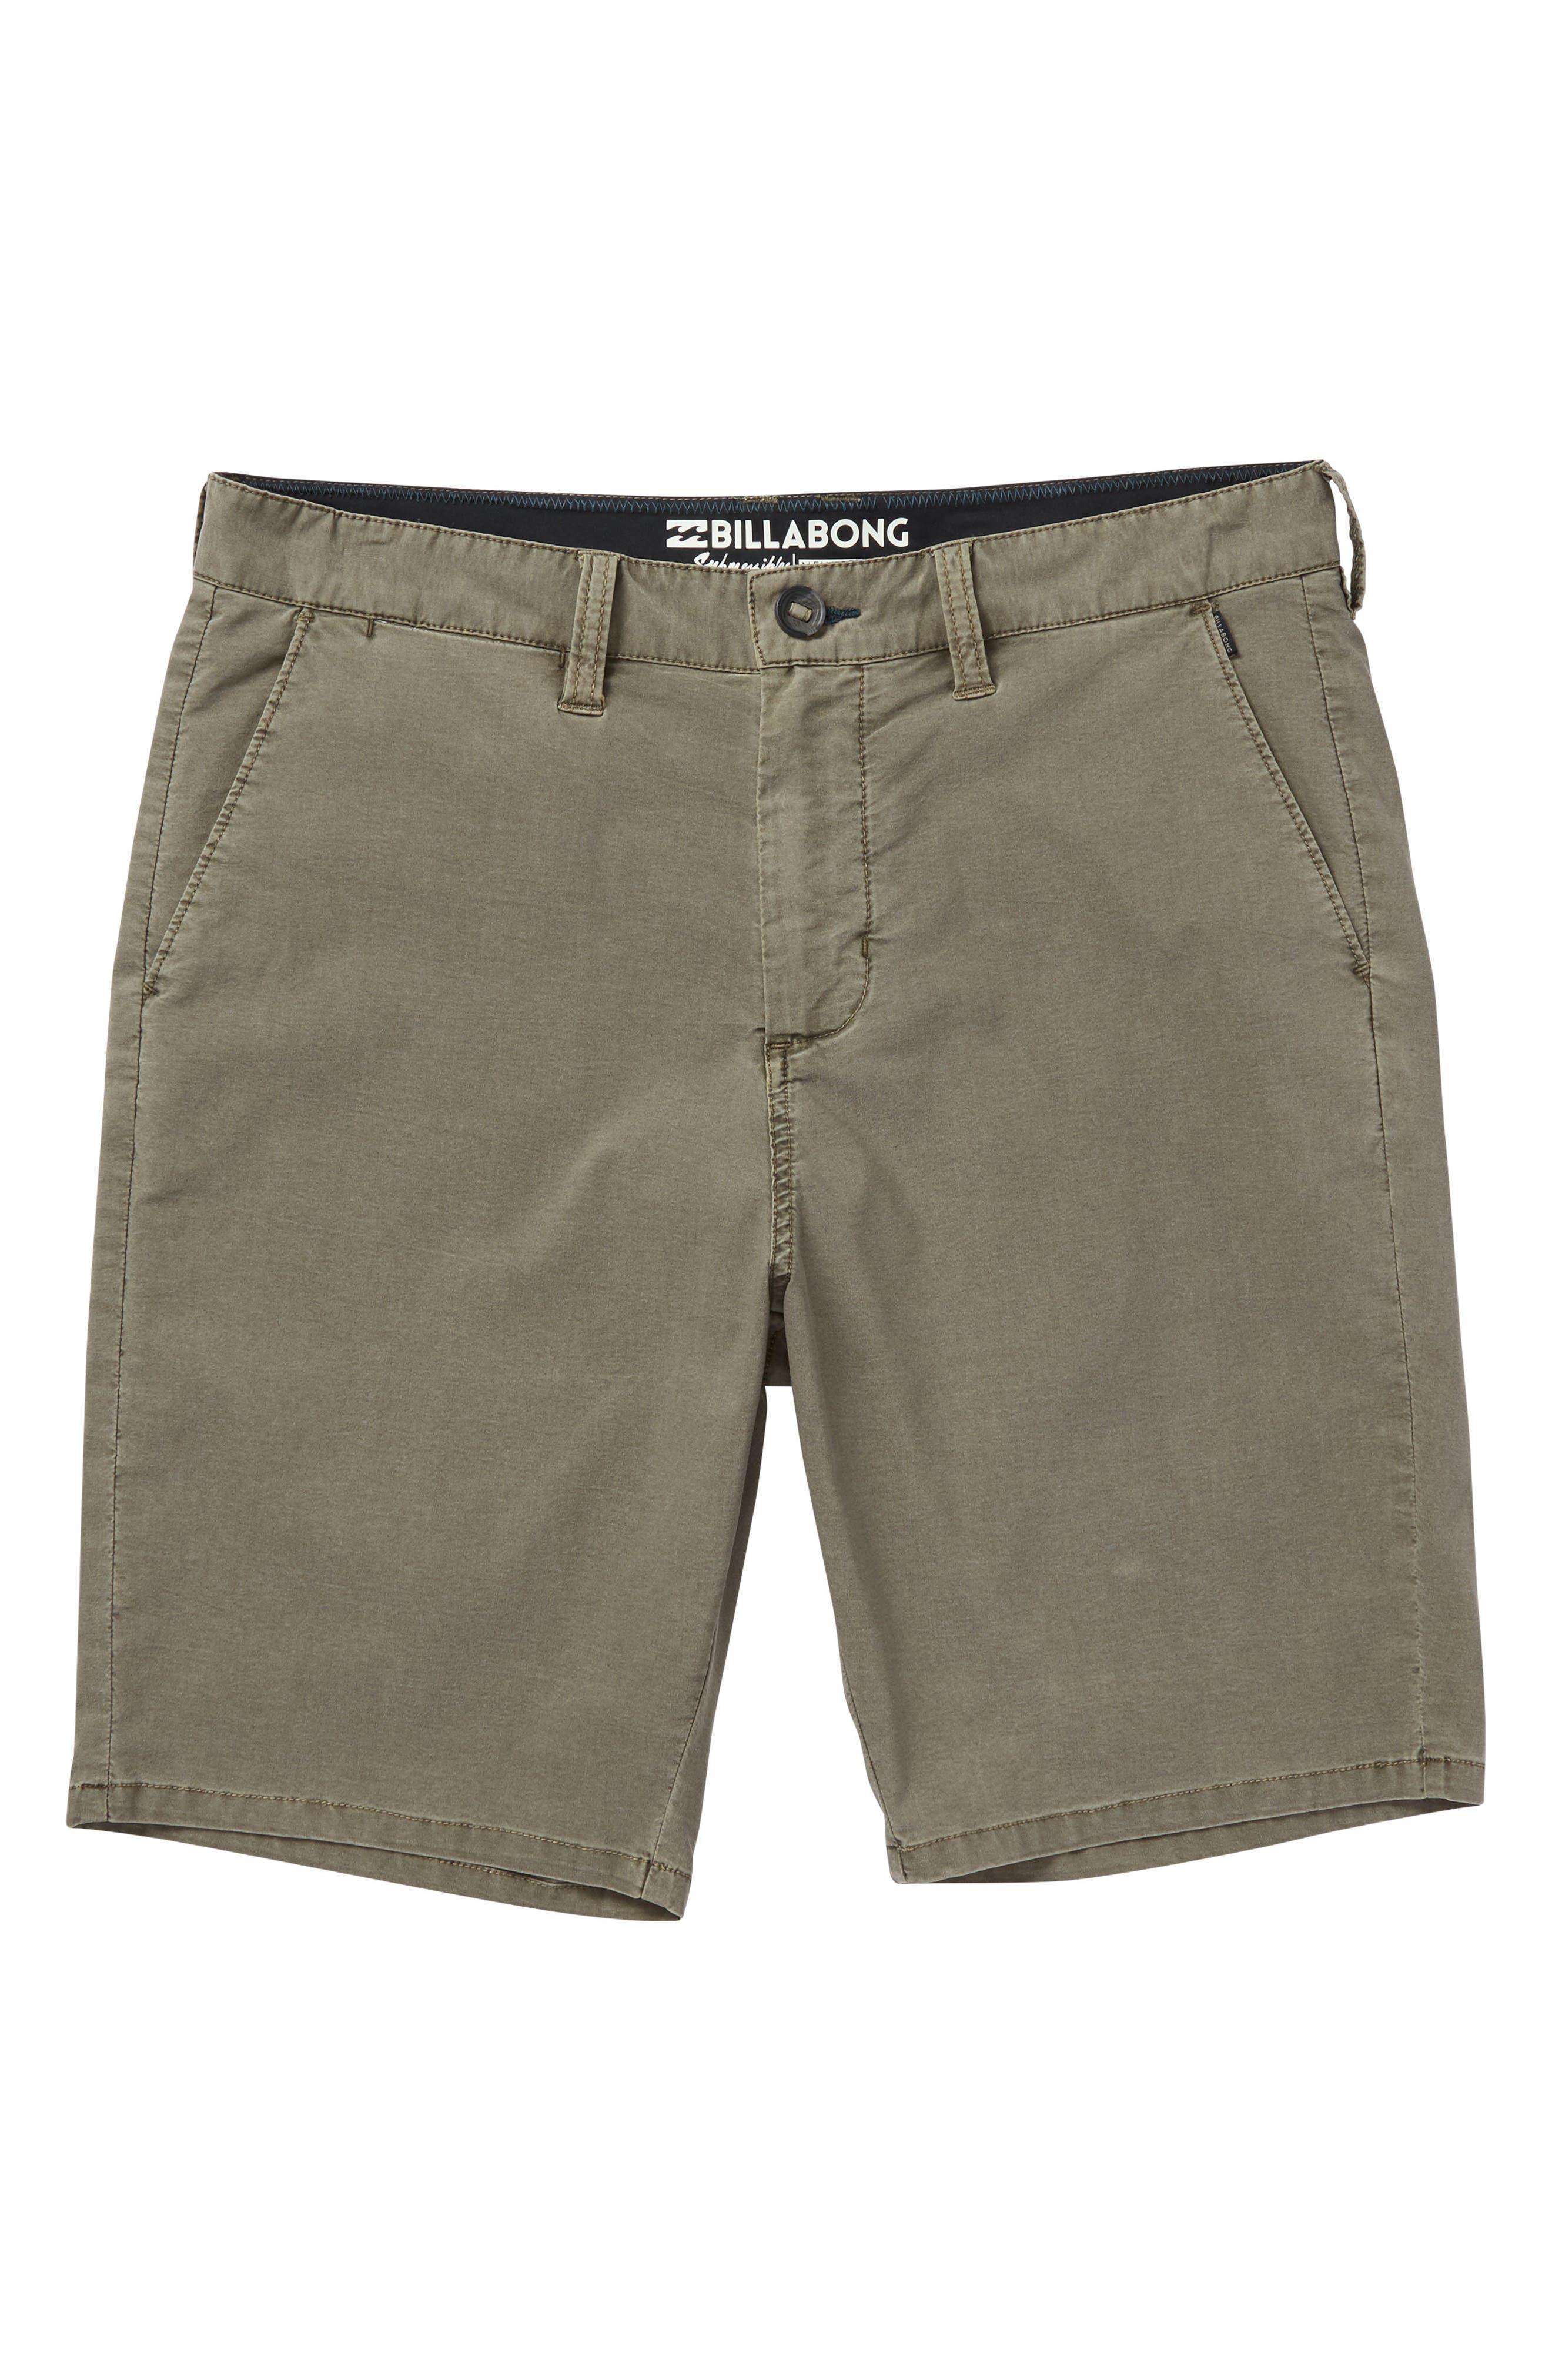 Billabong New Order X Overdye Hybrid Shorts (Big Boys)